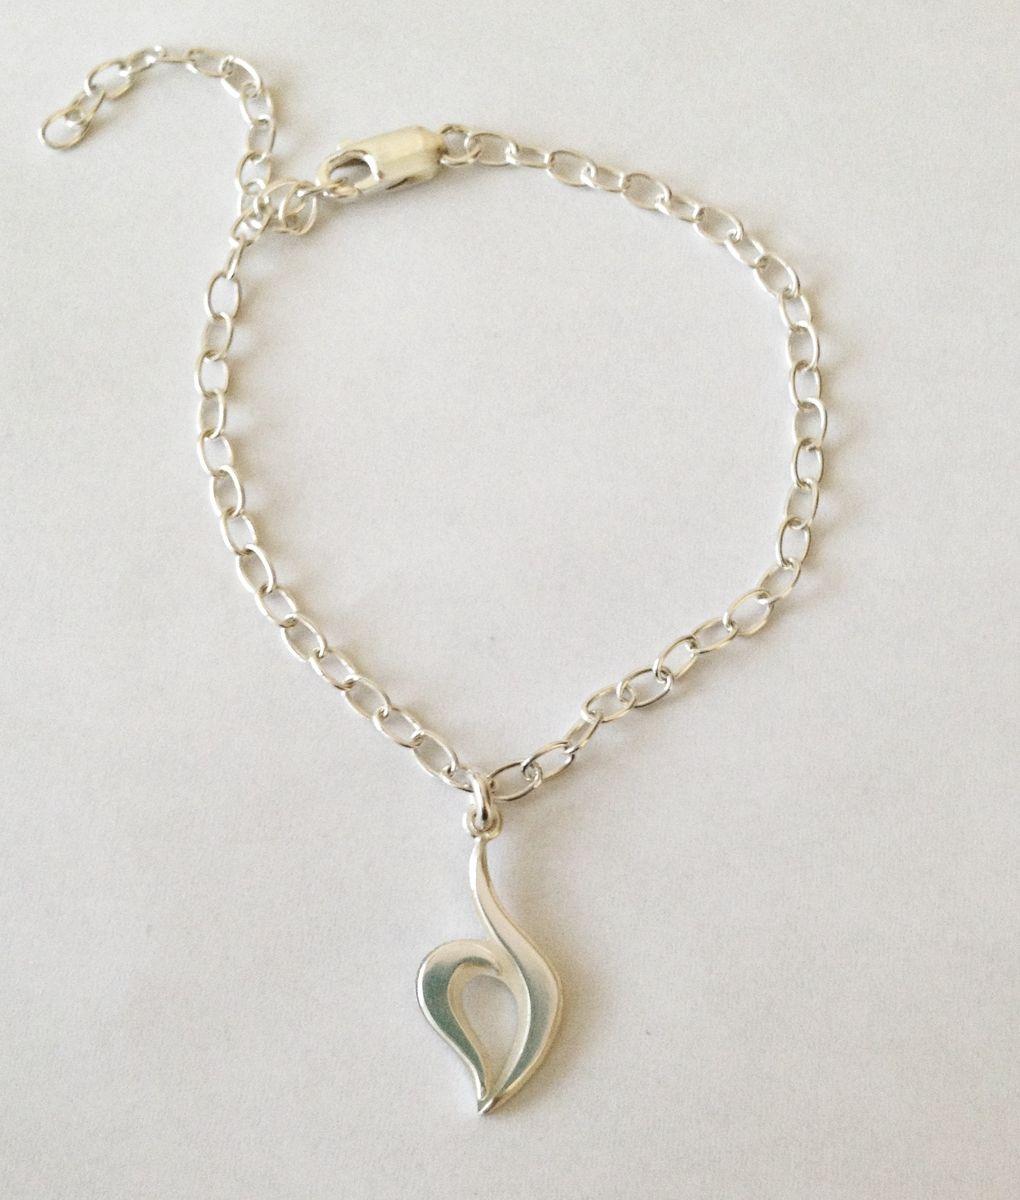 Bracelet Pendant Custom hip hop chains bling pendants custommade bracelet with eating disorder symbol audiocablefo